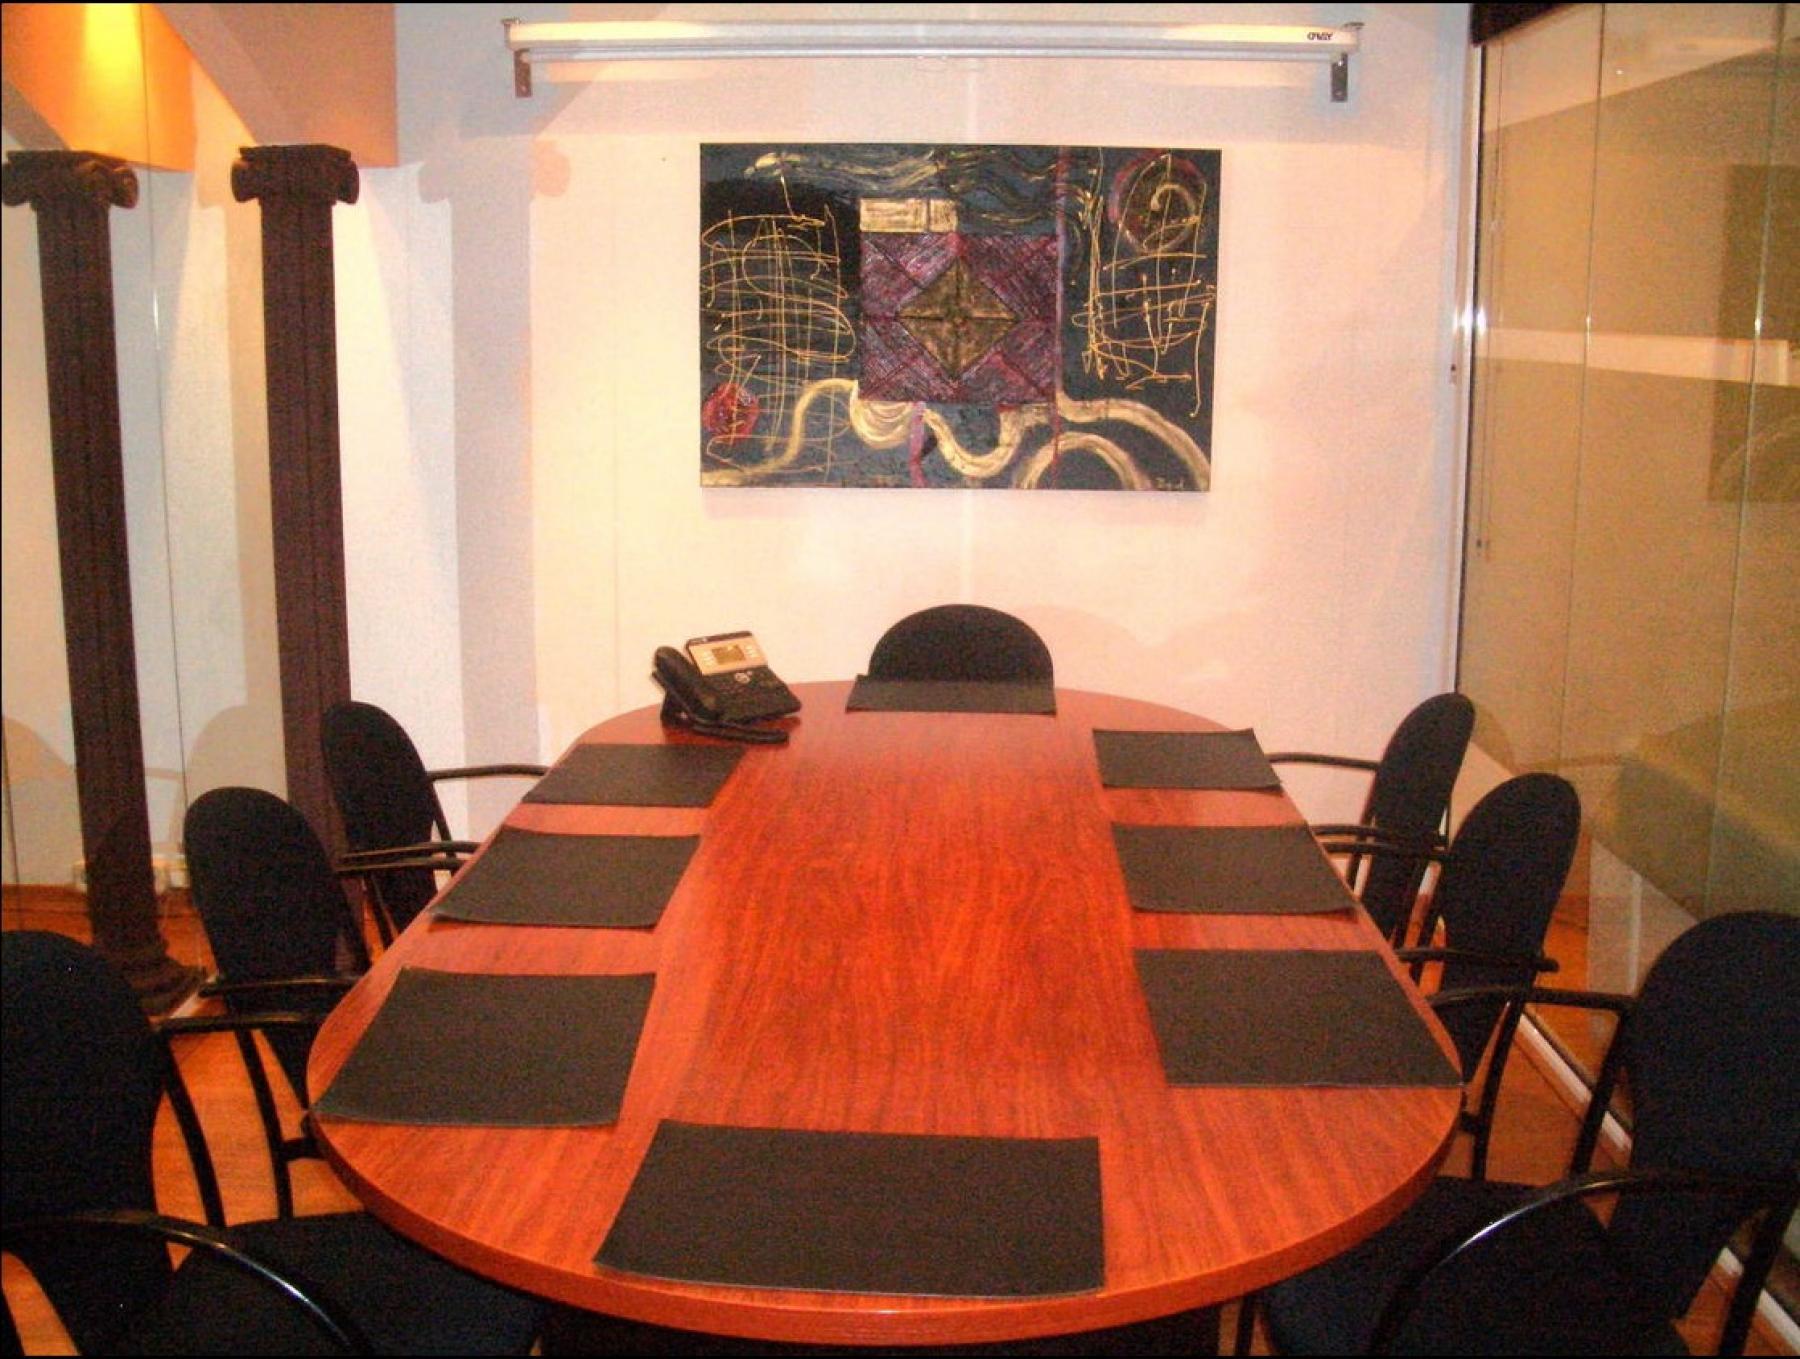 Another view of the conference room Carrer de la diputació